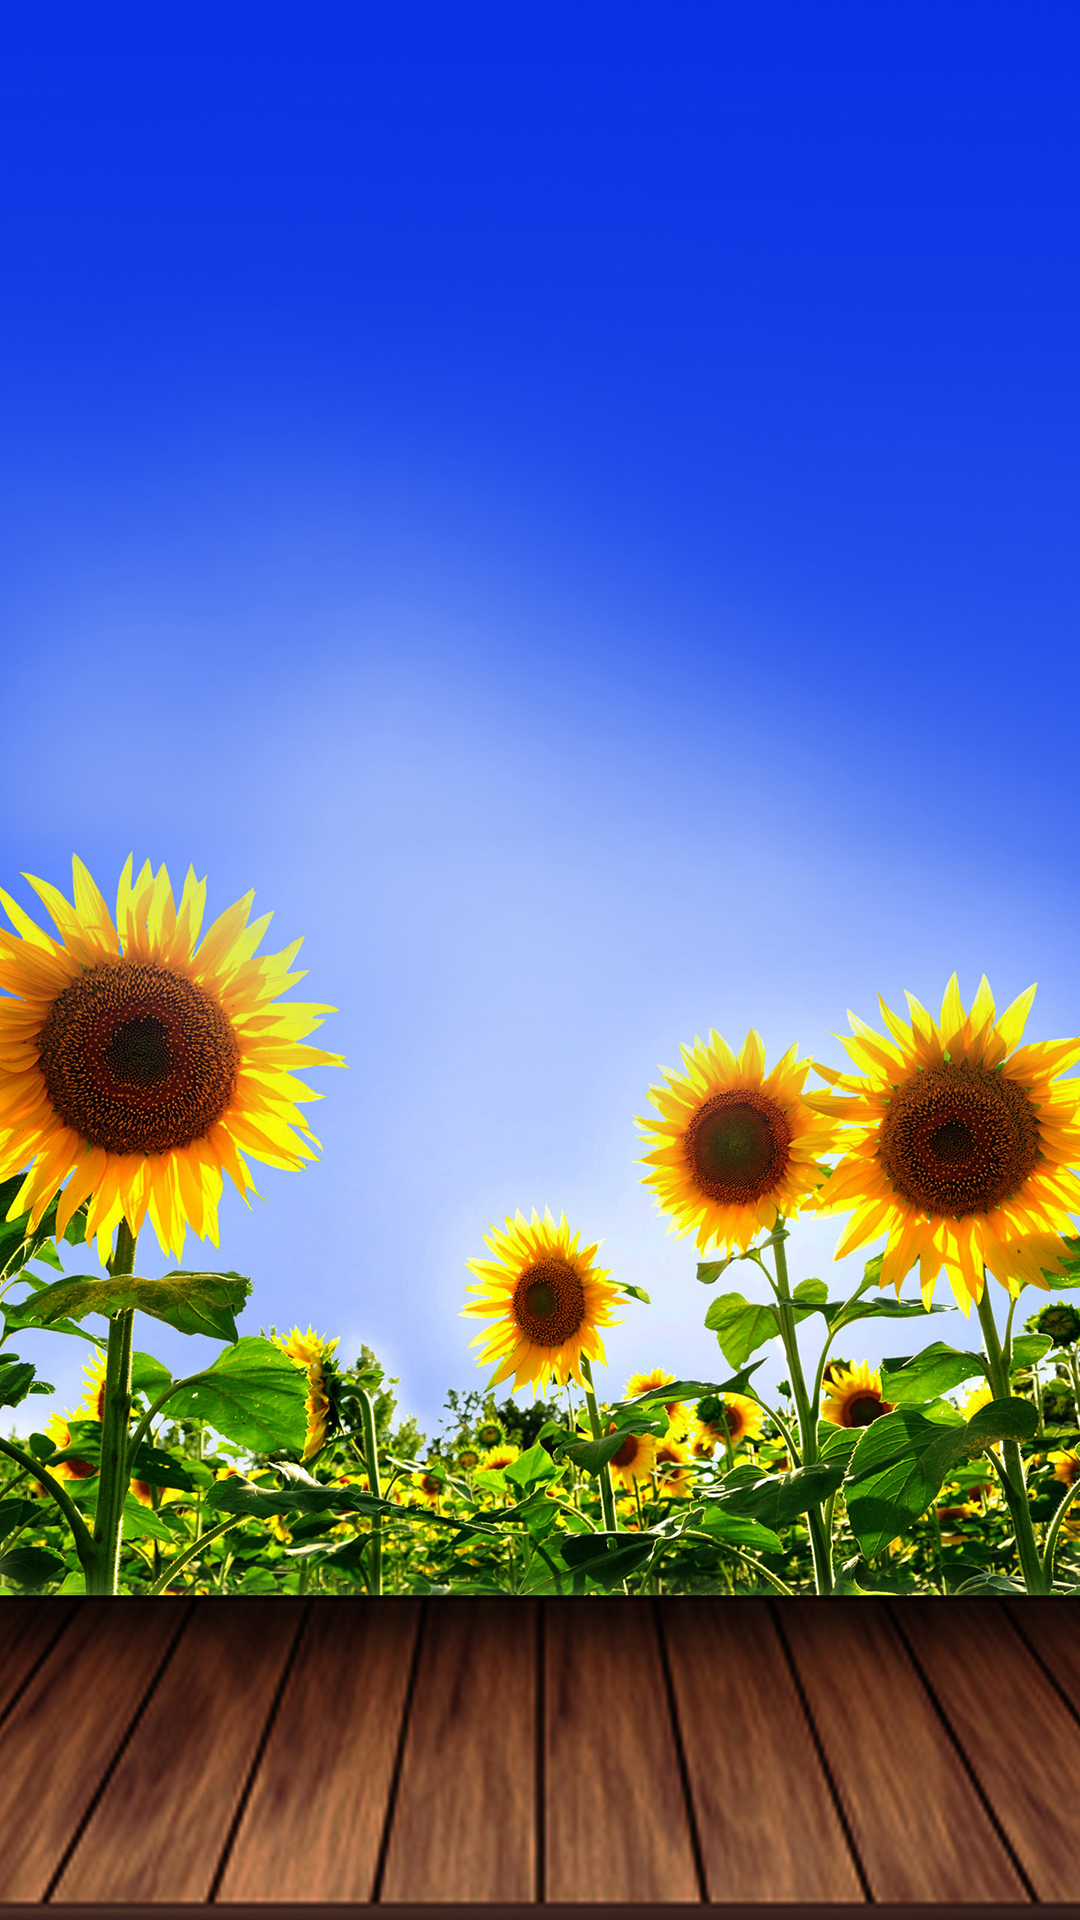 Sunflower Wallpaper Iphone 6 Plus Free Wallpaper Phone